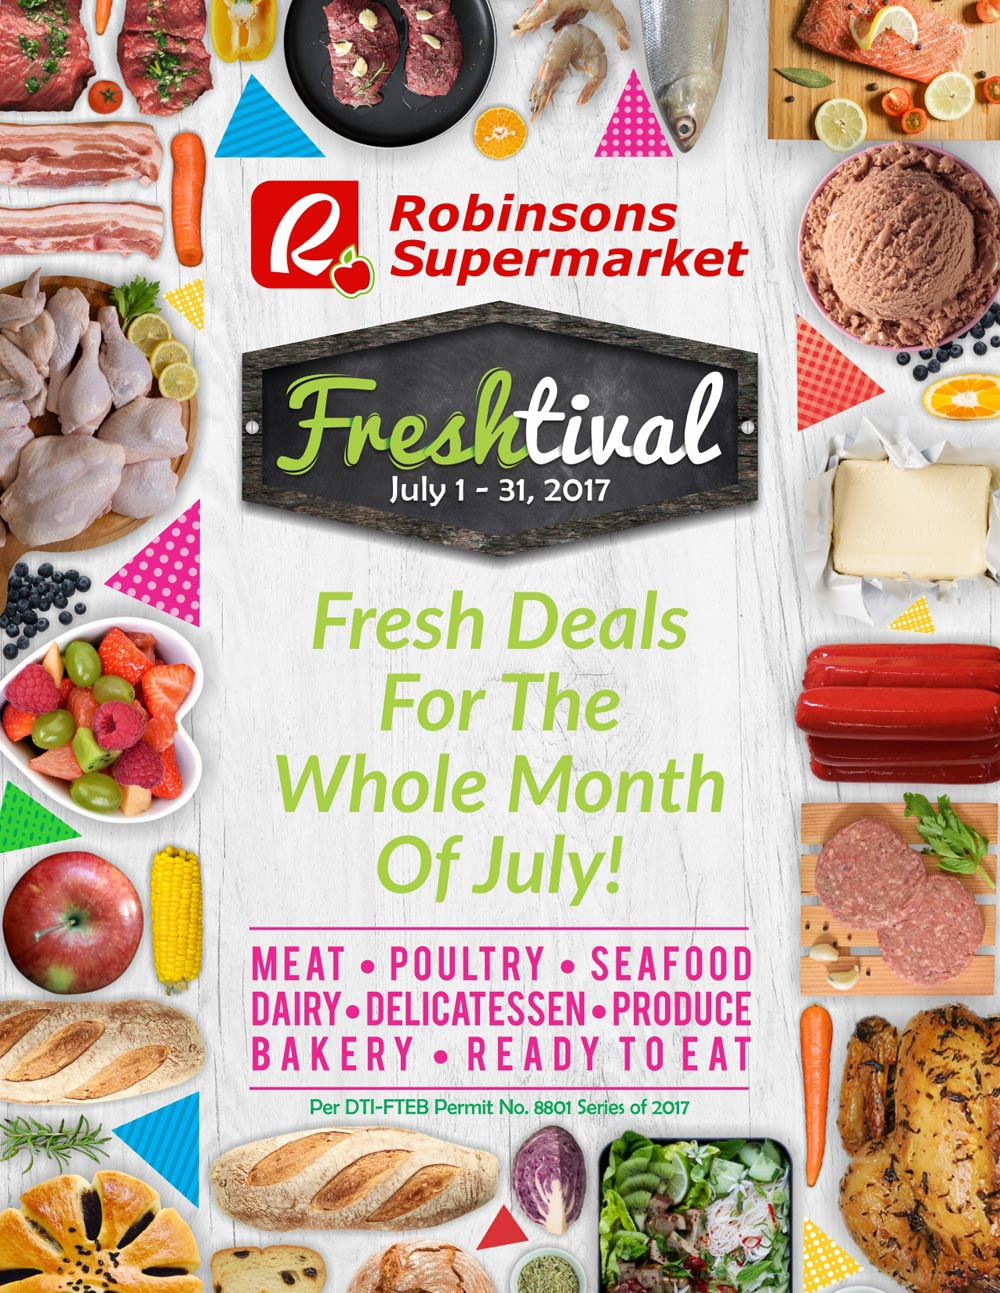 robinsons supermarket freshtival 2017